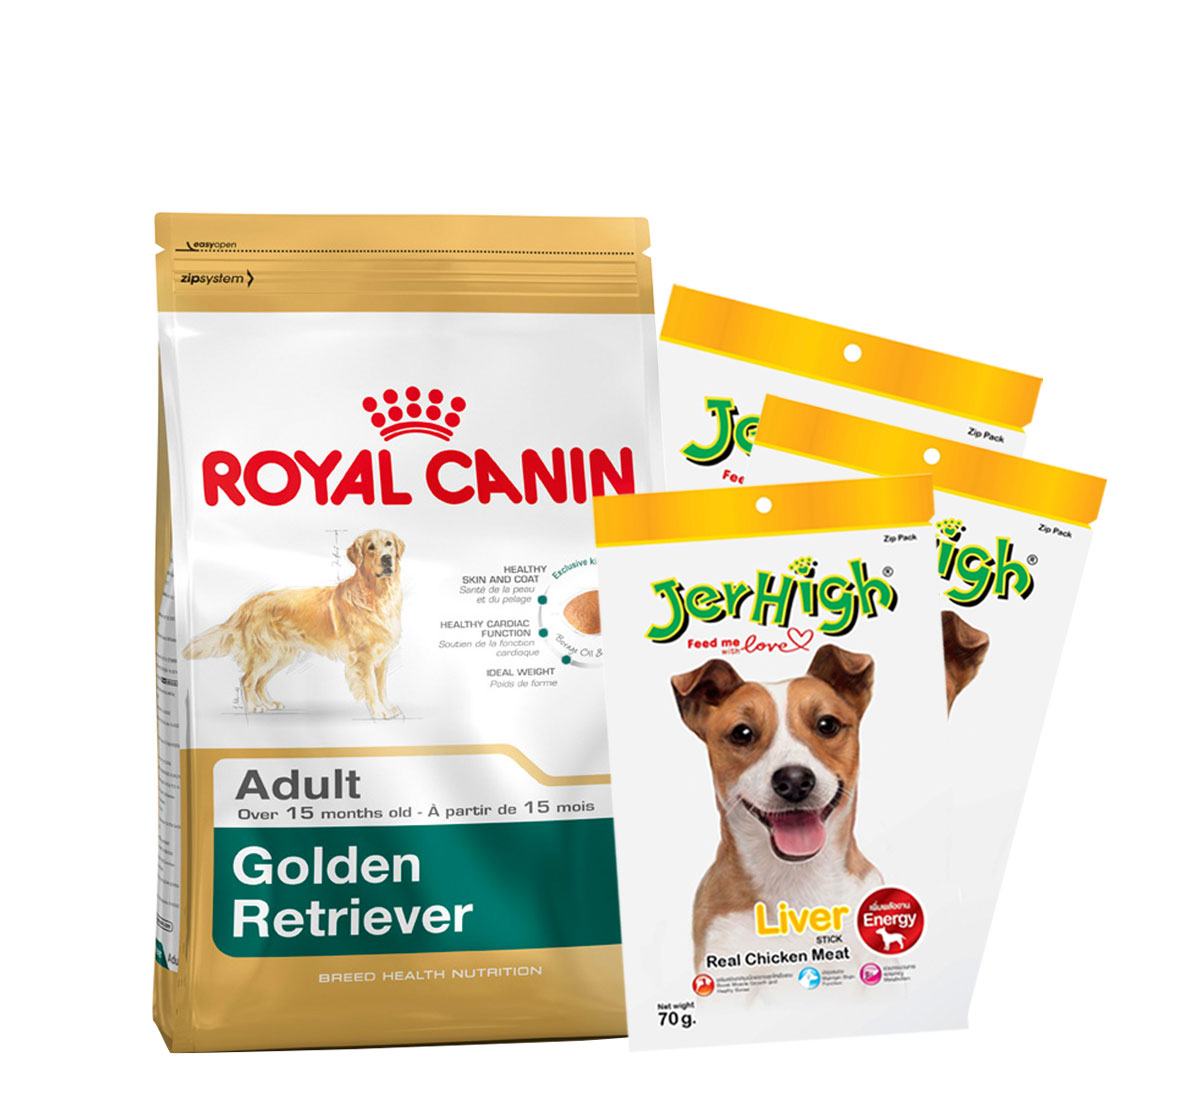 Royal Canin Golden Retriever Adult - 3 Kg with Treats